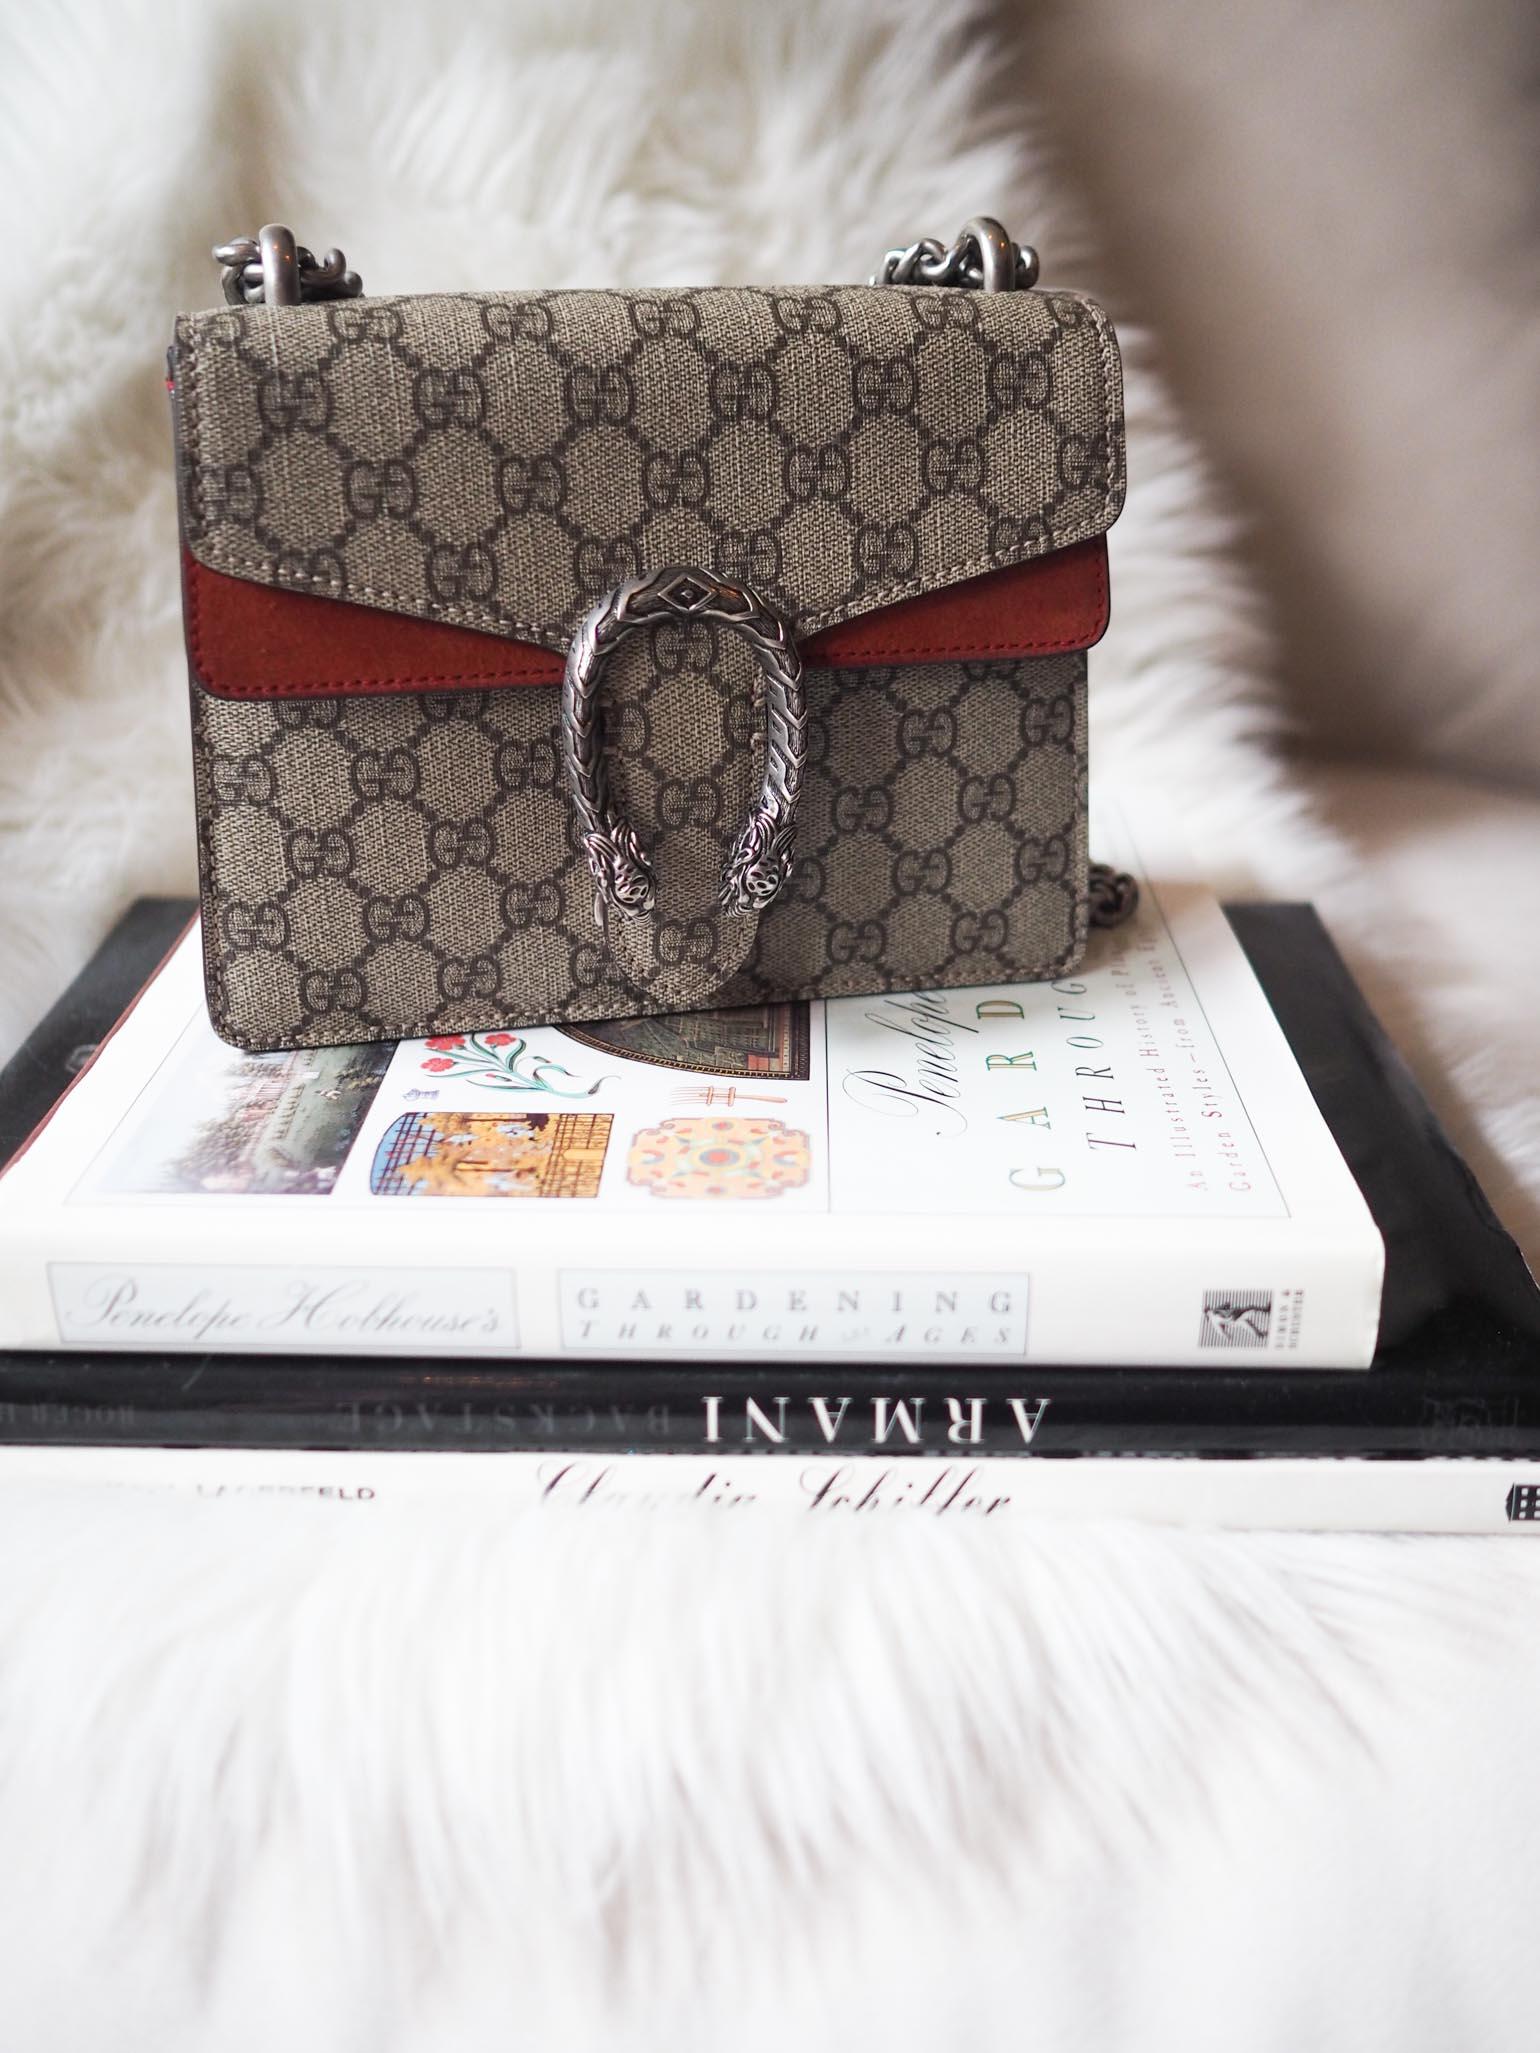 57025d217 Gucci Dionysus Supreme Mini Handbag Review - The Brunette Nomad